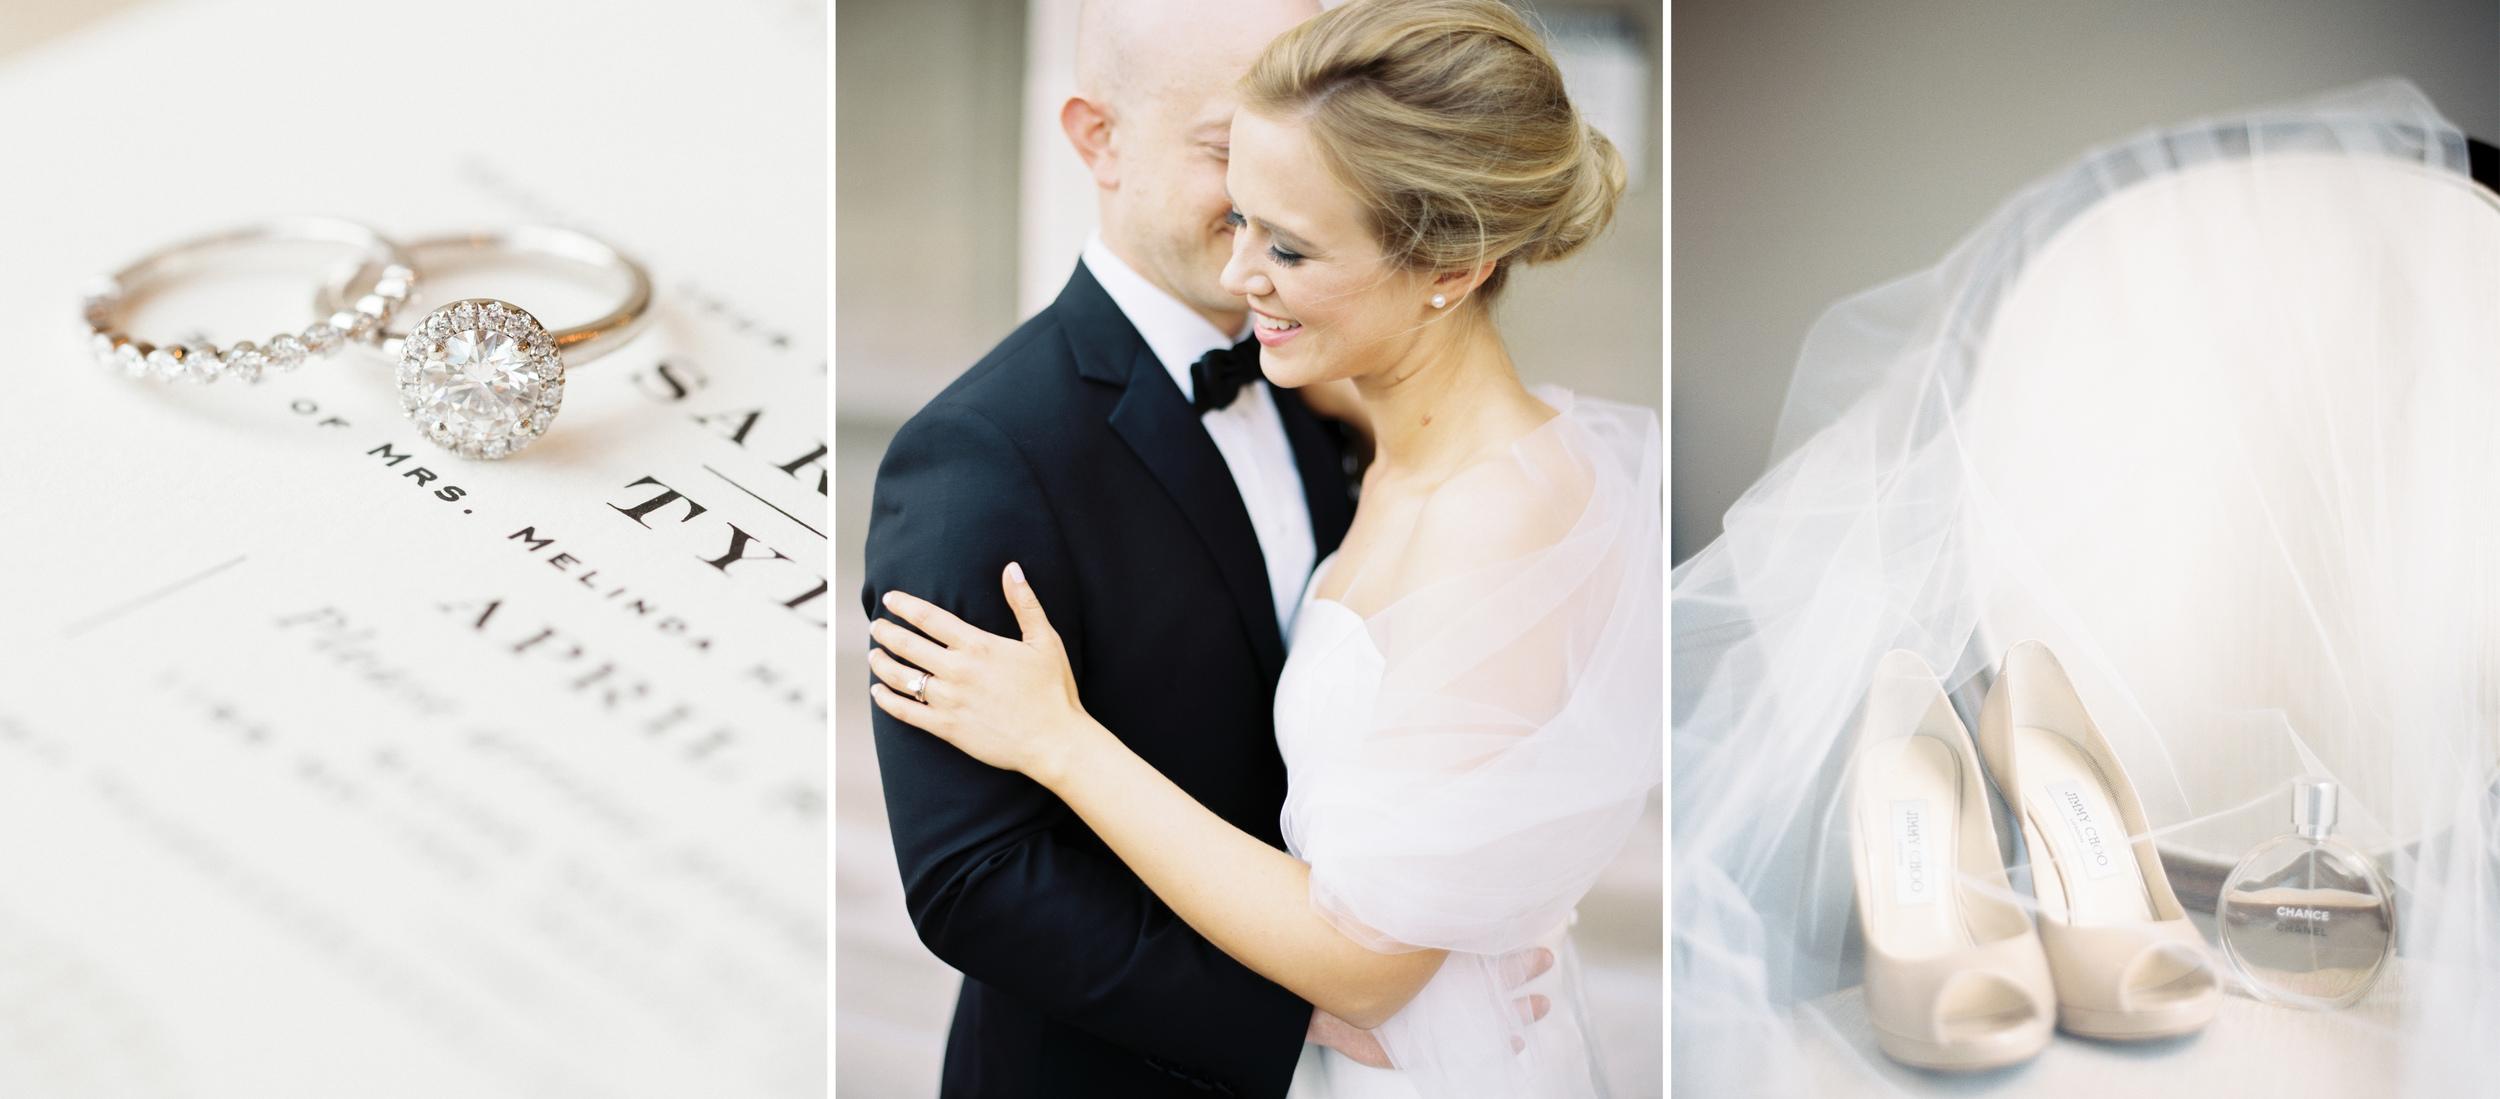 WeddingPhotographyStLouisCarrettoStudio.jpg